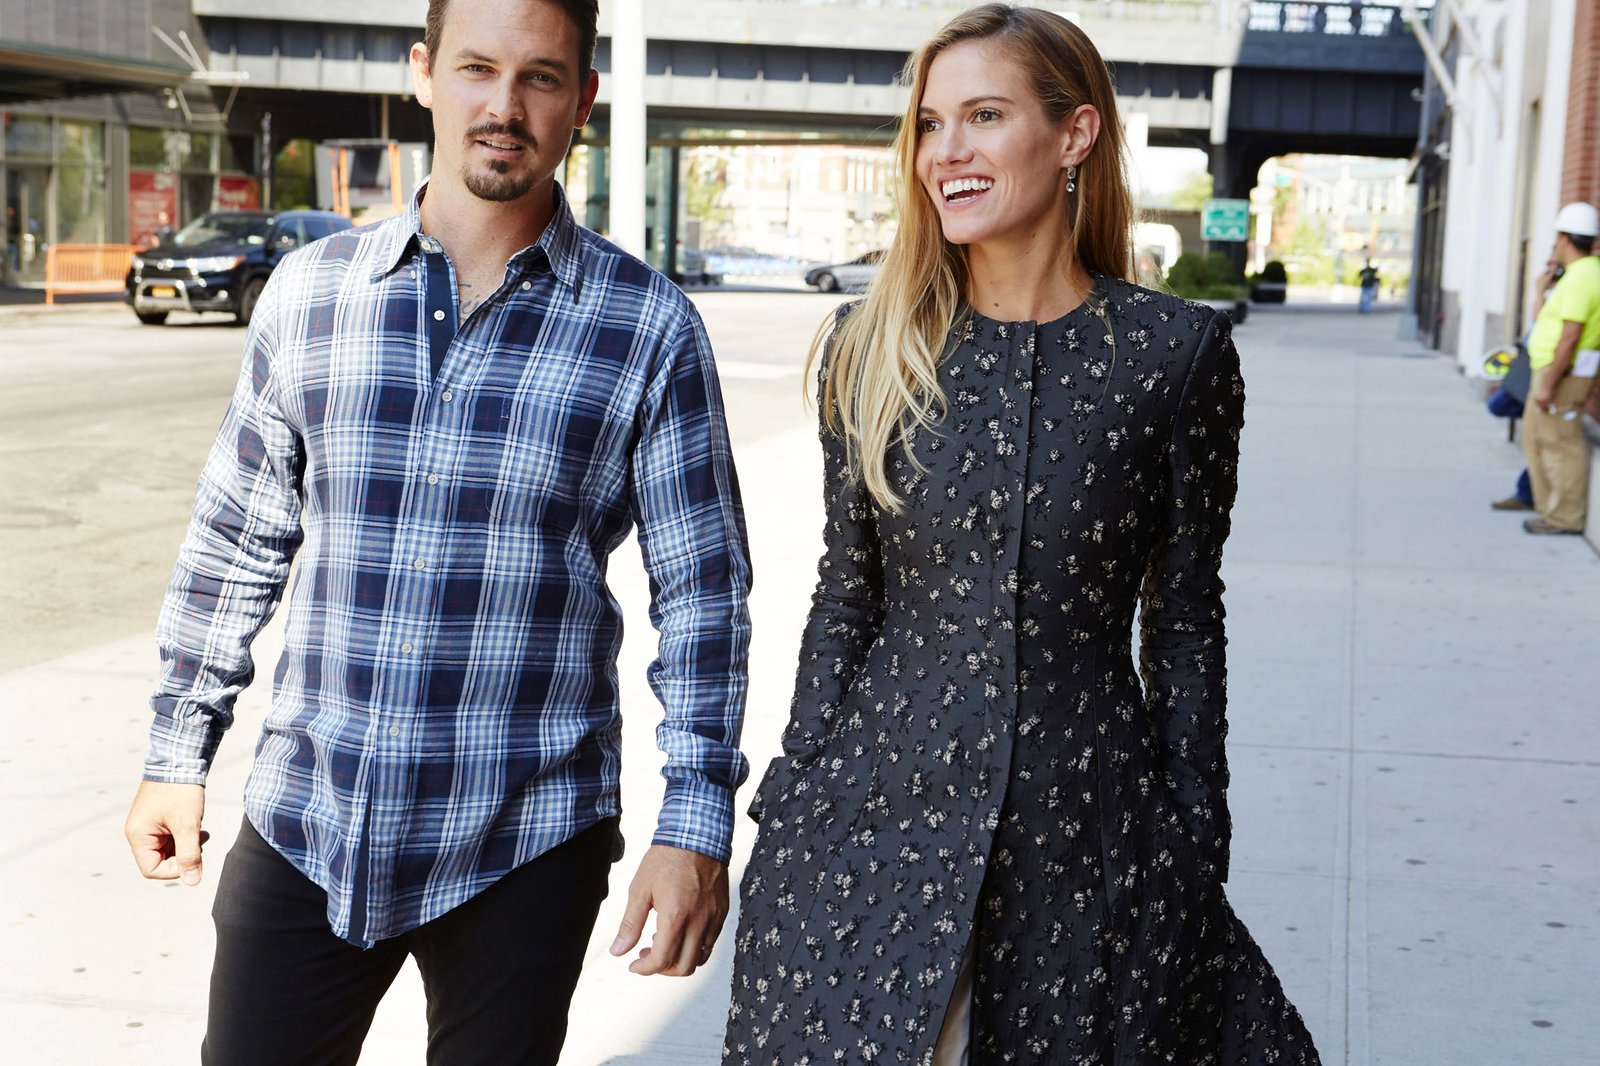 Kristopher e Laura, da Brock Collection. Foto: Vogue US.